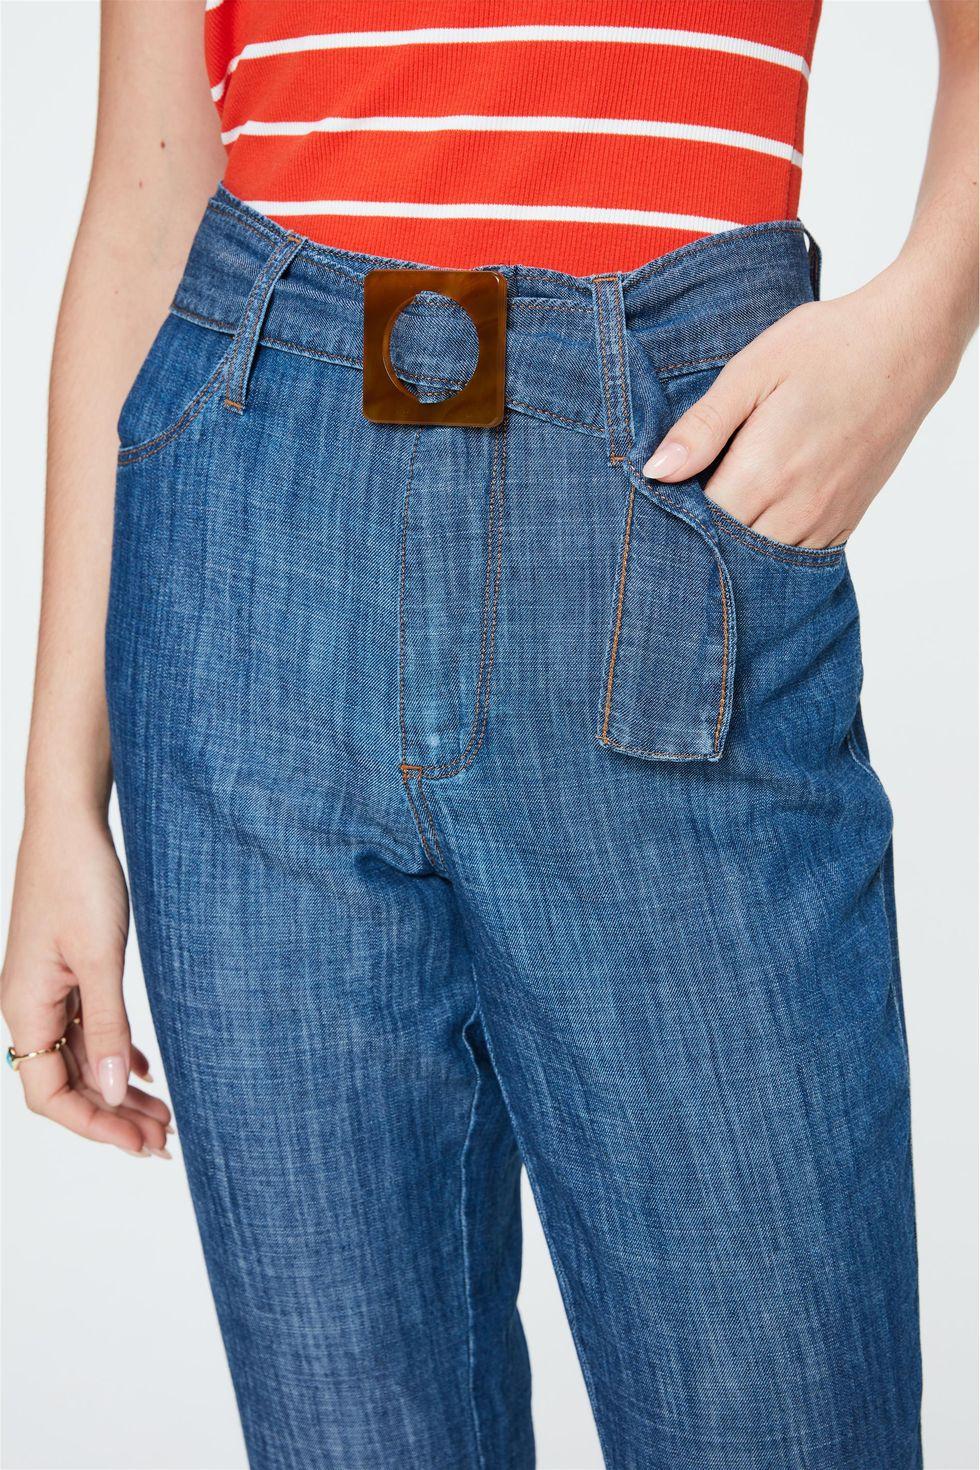 Calca-Jeans-Alfaiataria-de-Cintura-Alta-Frente--